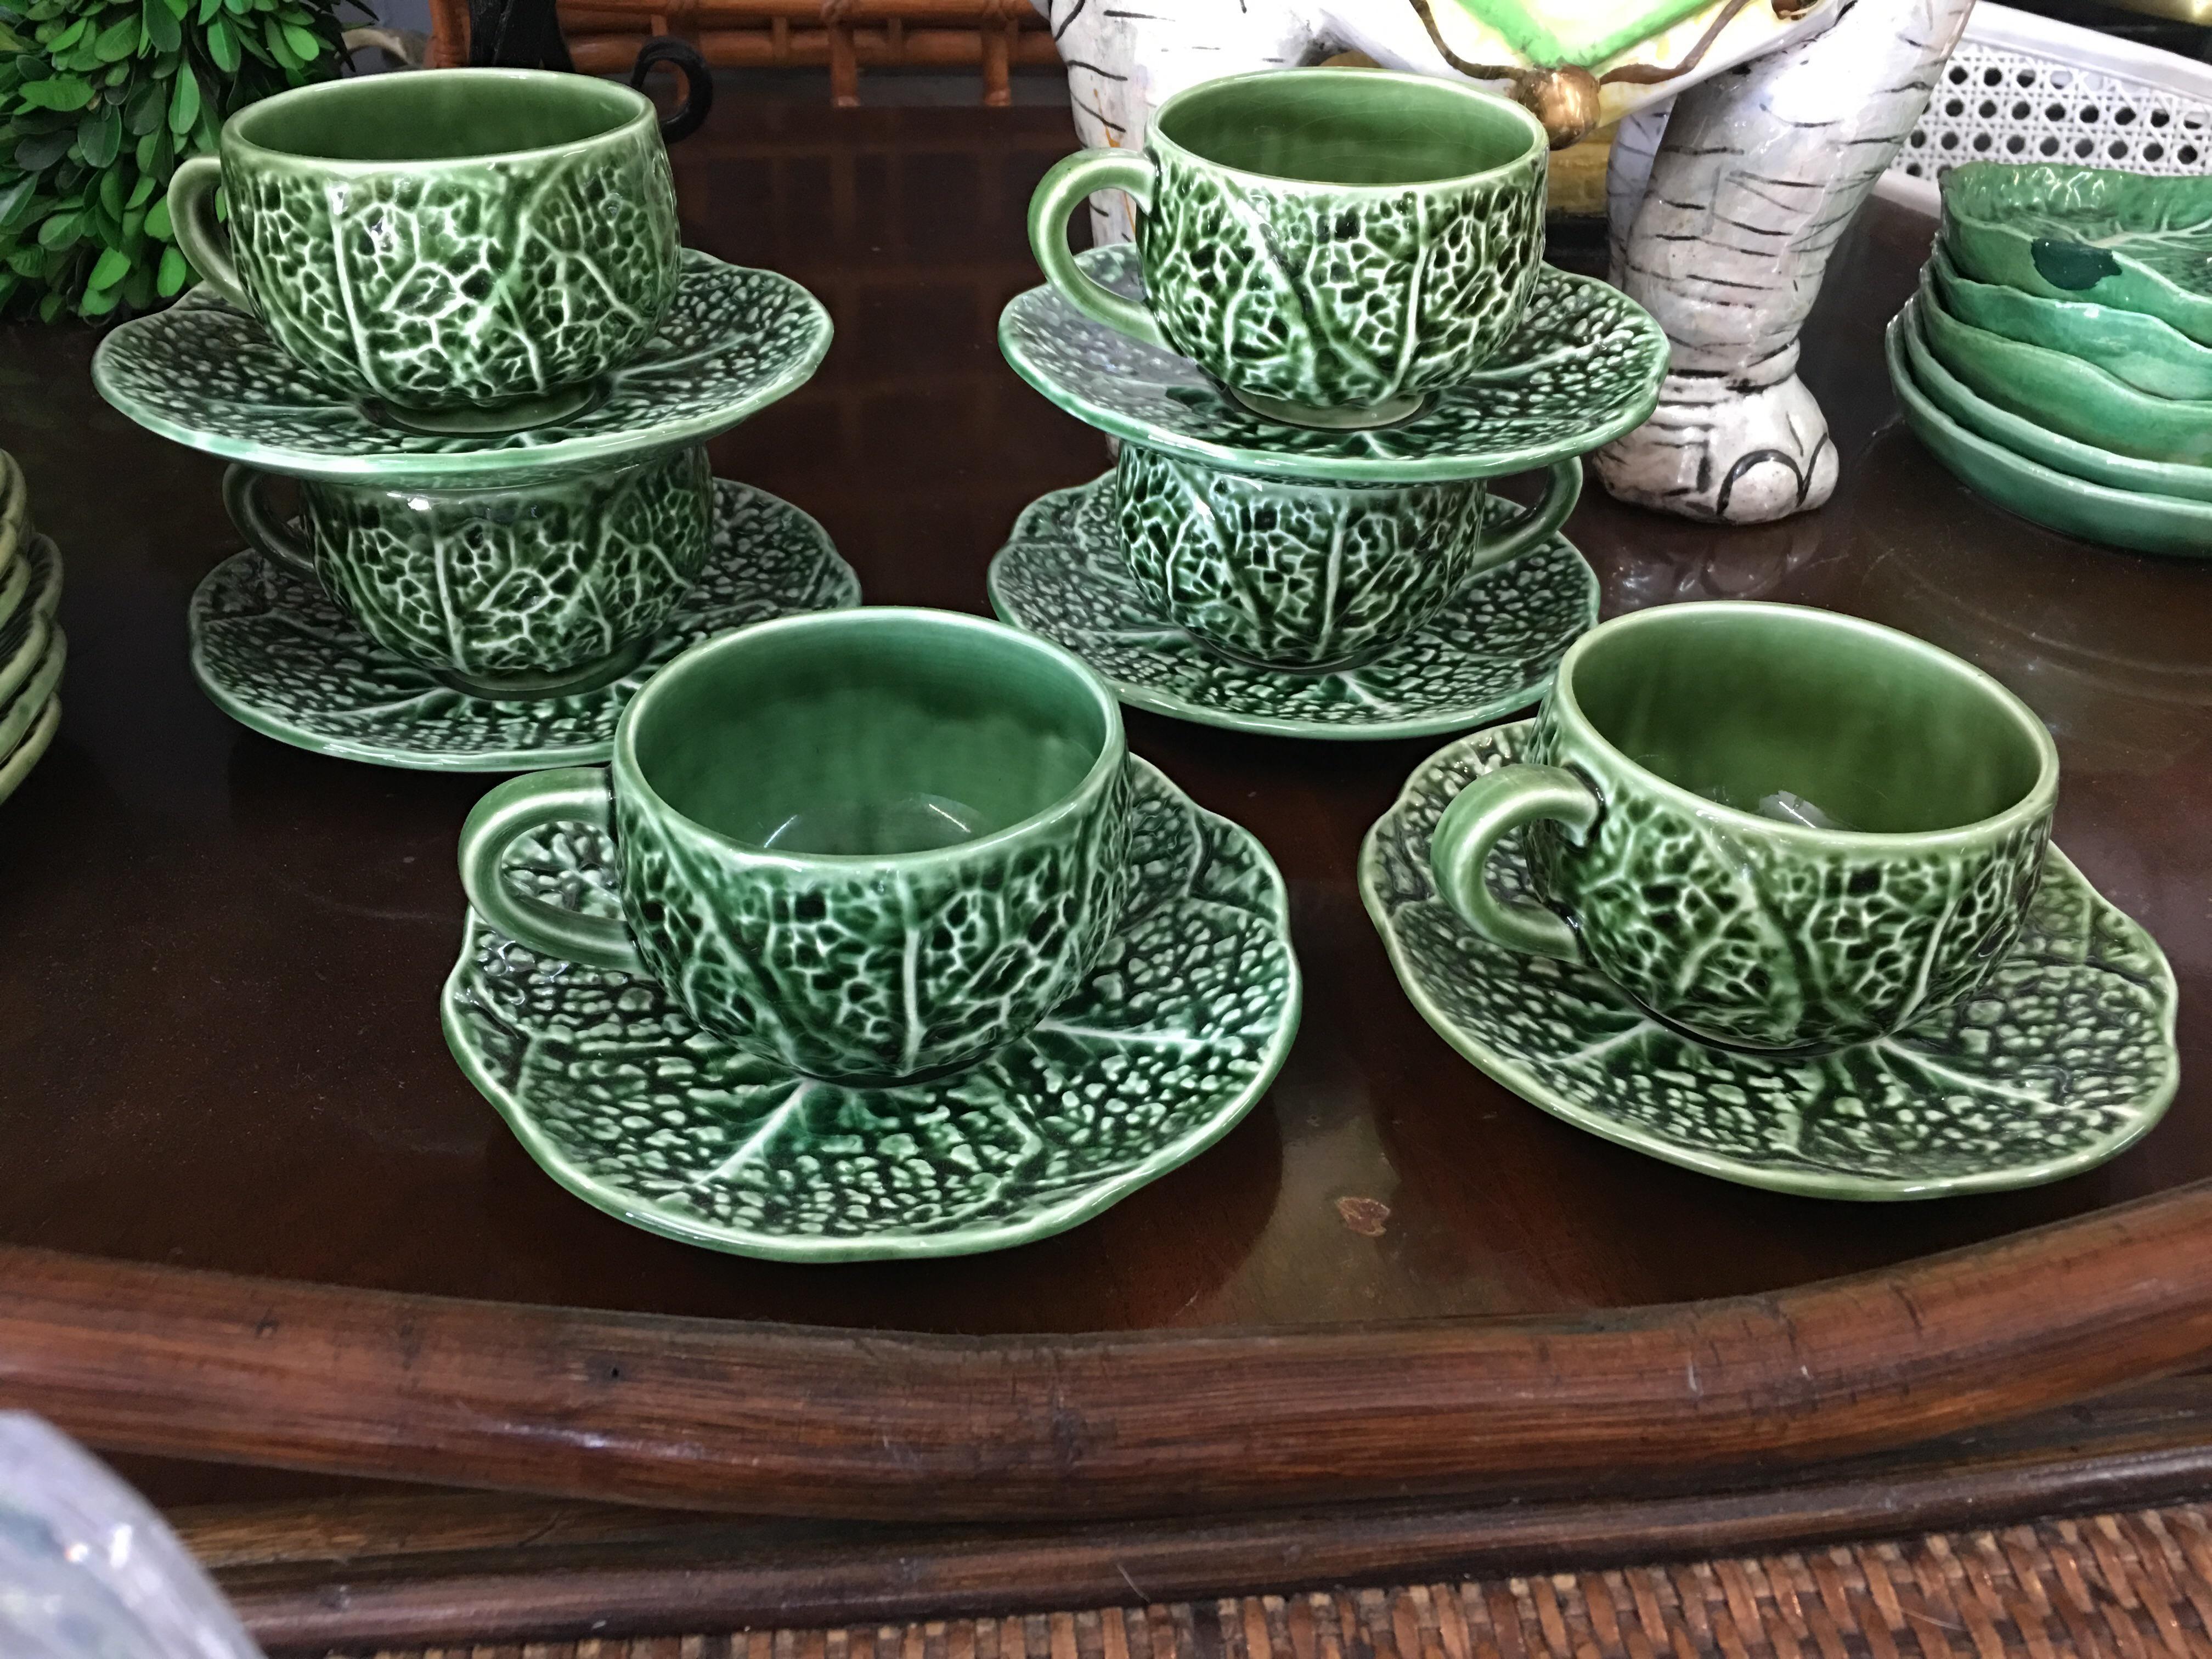 Portuguese Majolica Tea Coffee Cups \u0026 Saucers - Set of 6 - Image 2 ...  sc 1 st  Chairish & Portuguese Majolica Tea Coffee Cups \u0026 Saucers - Set of 6 | Chairish